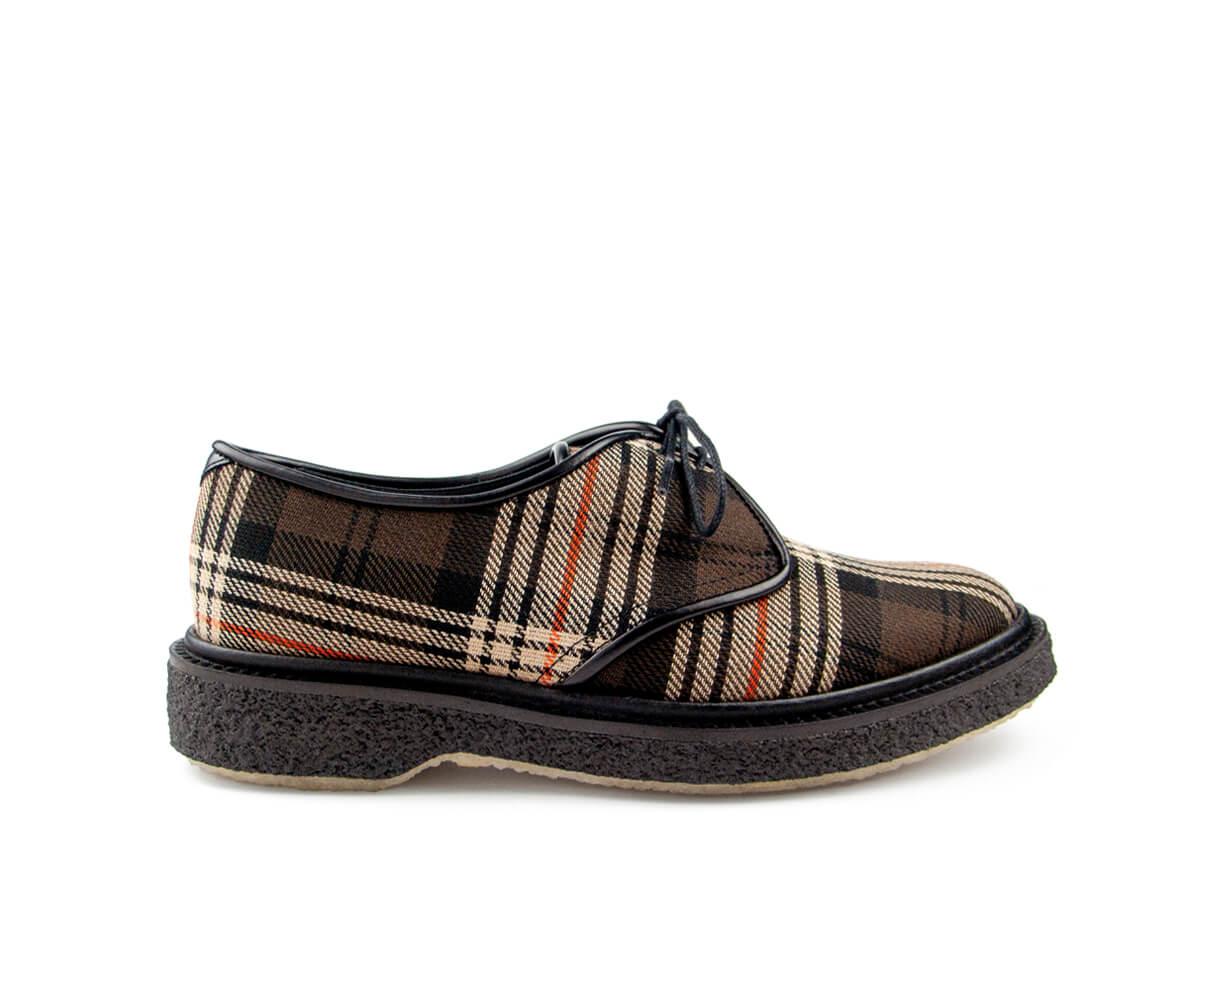 003 ecla scarpe rgb